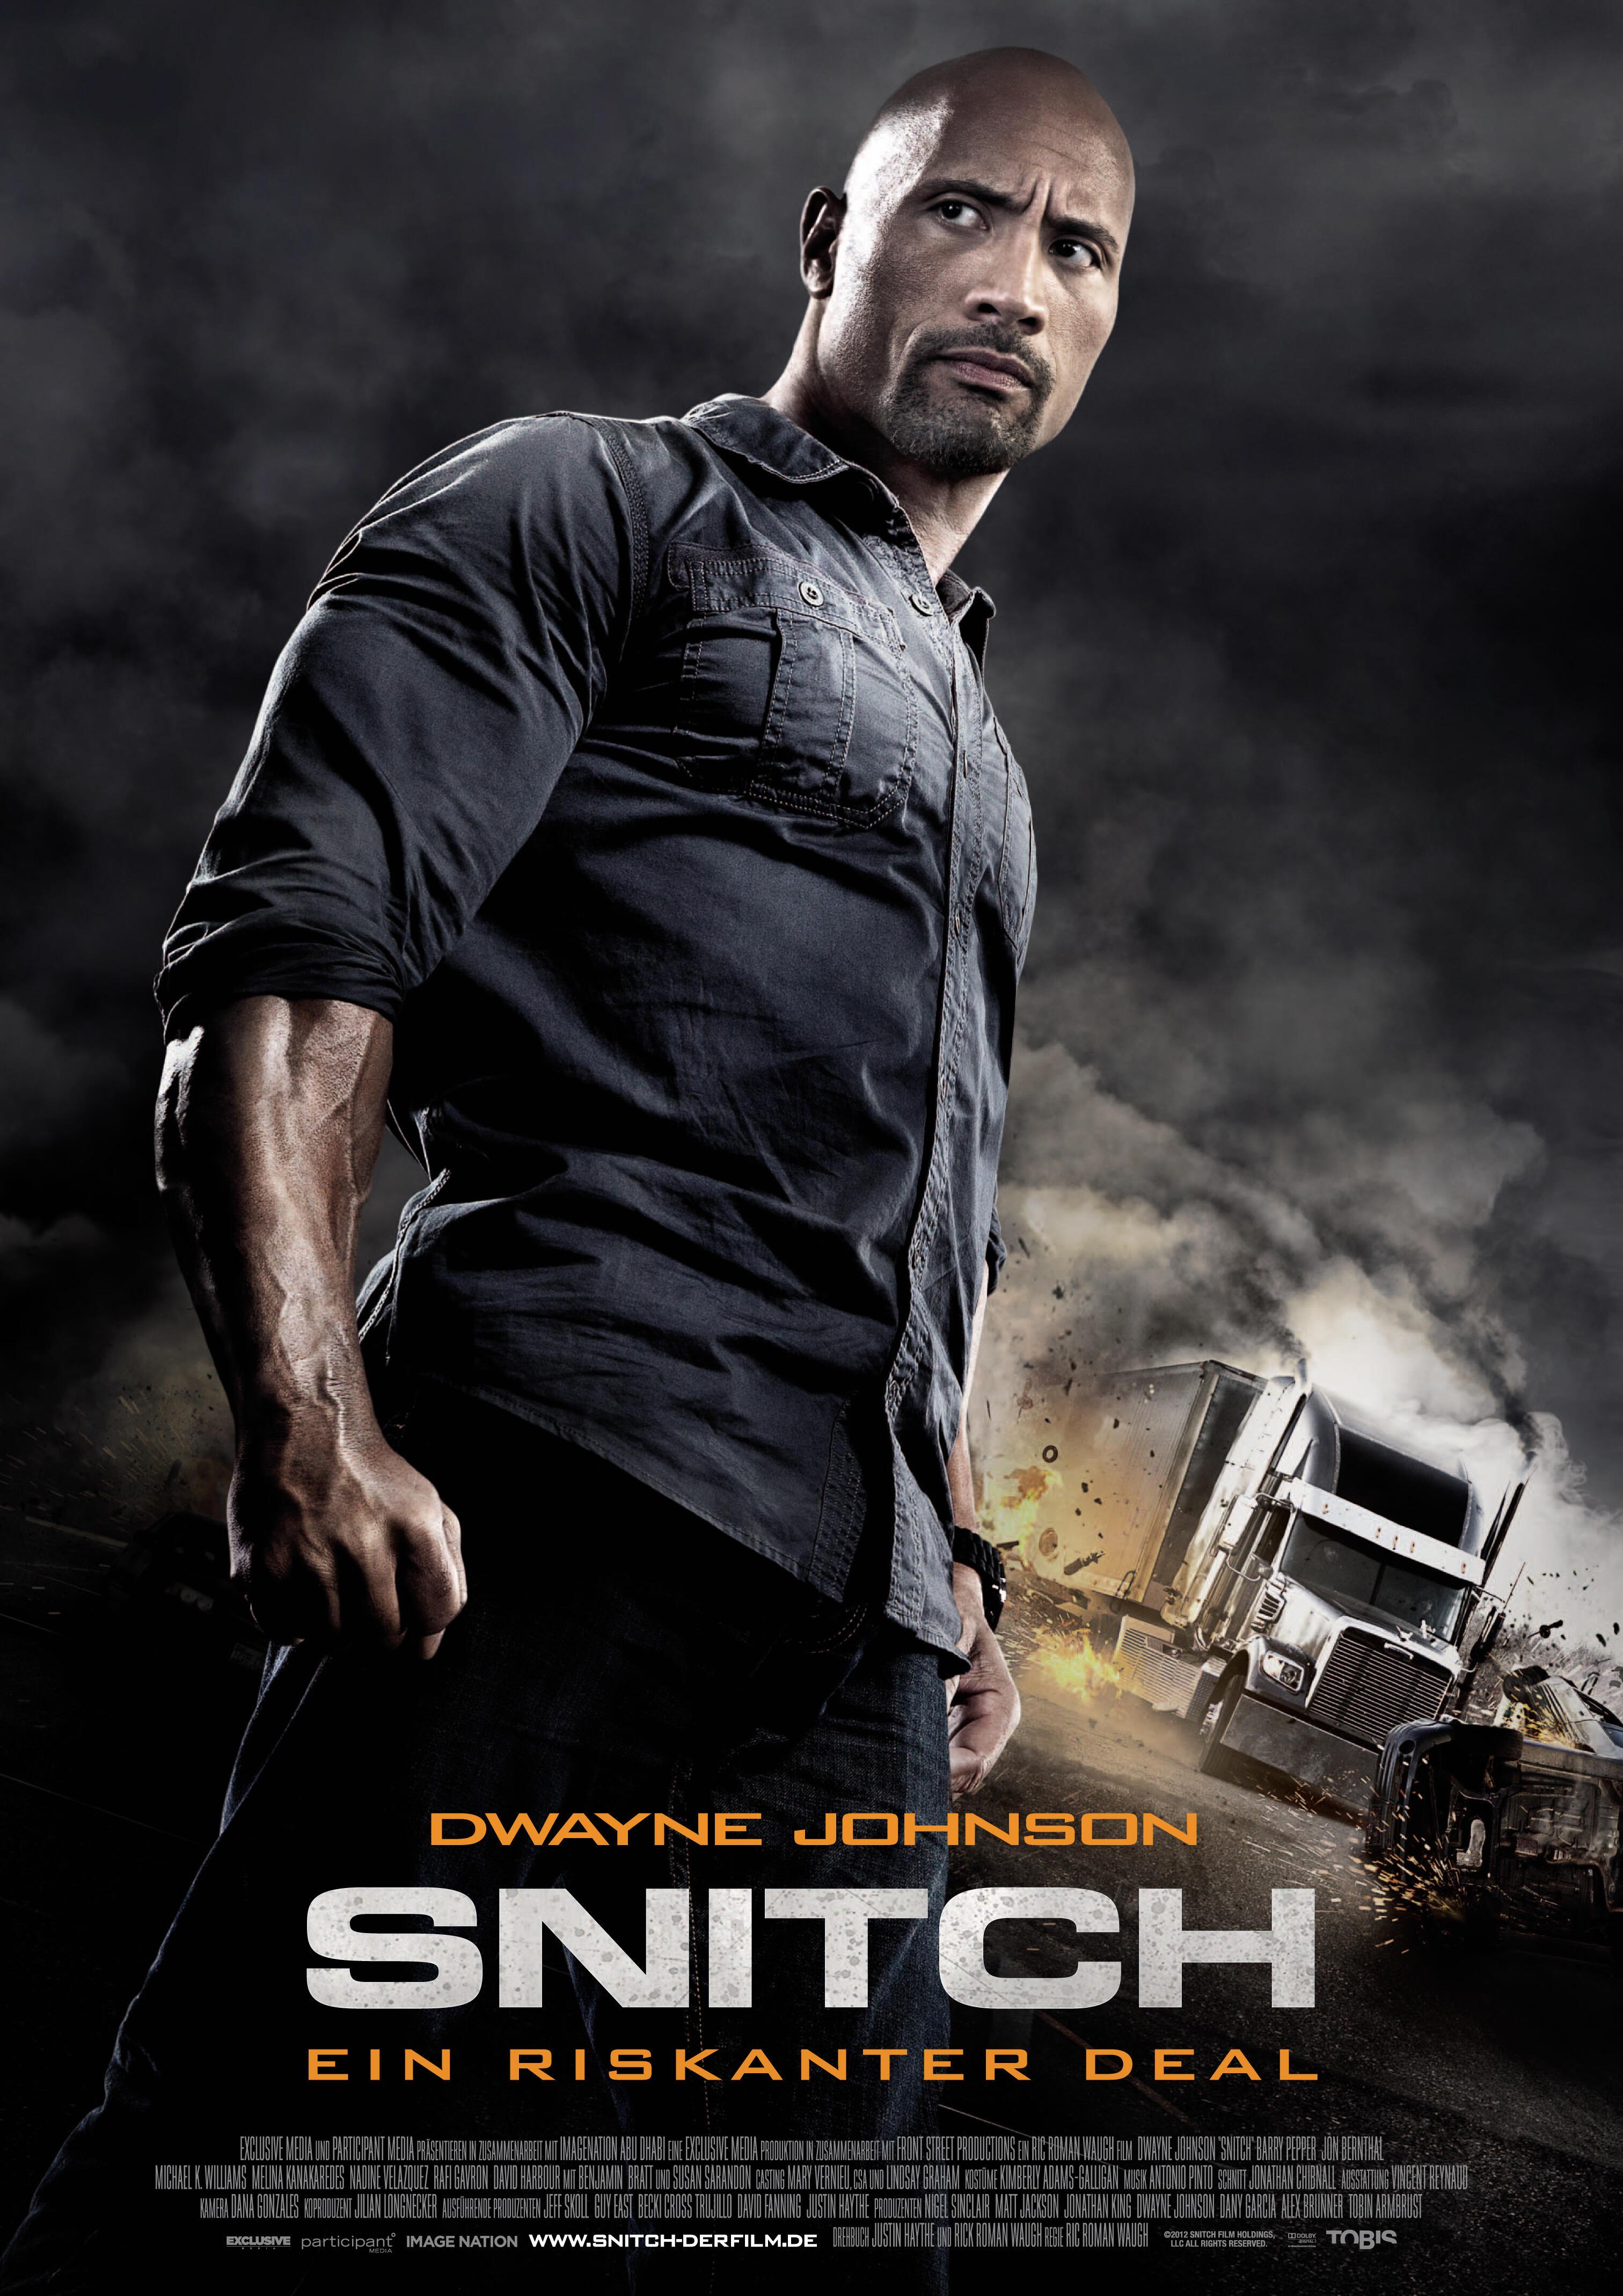 snitch – ein riskanter deal stream